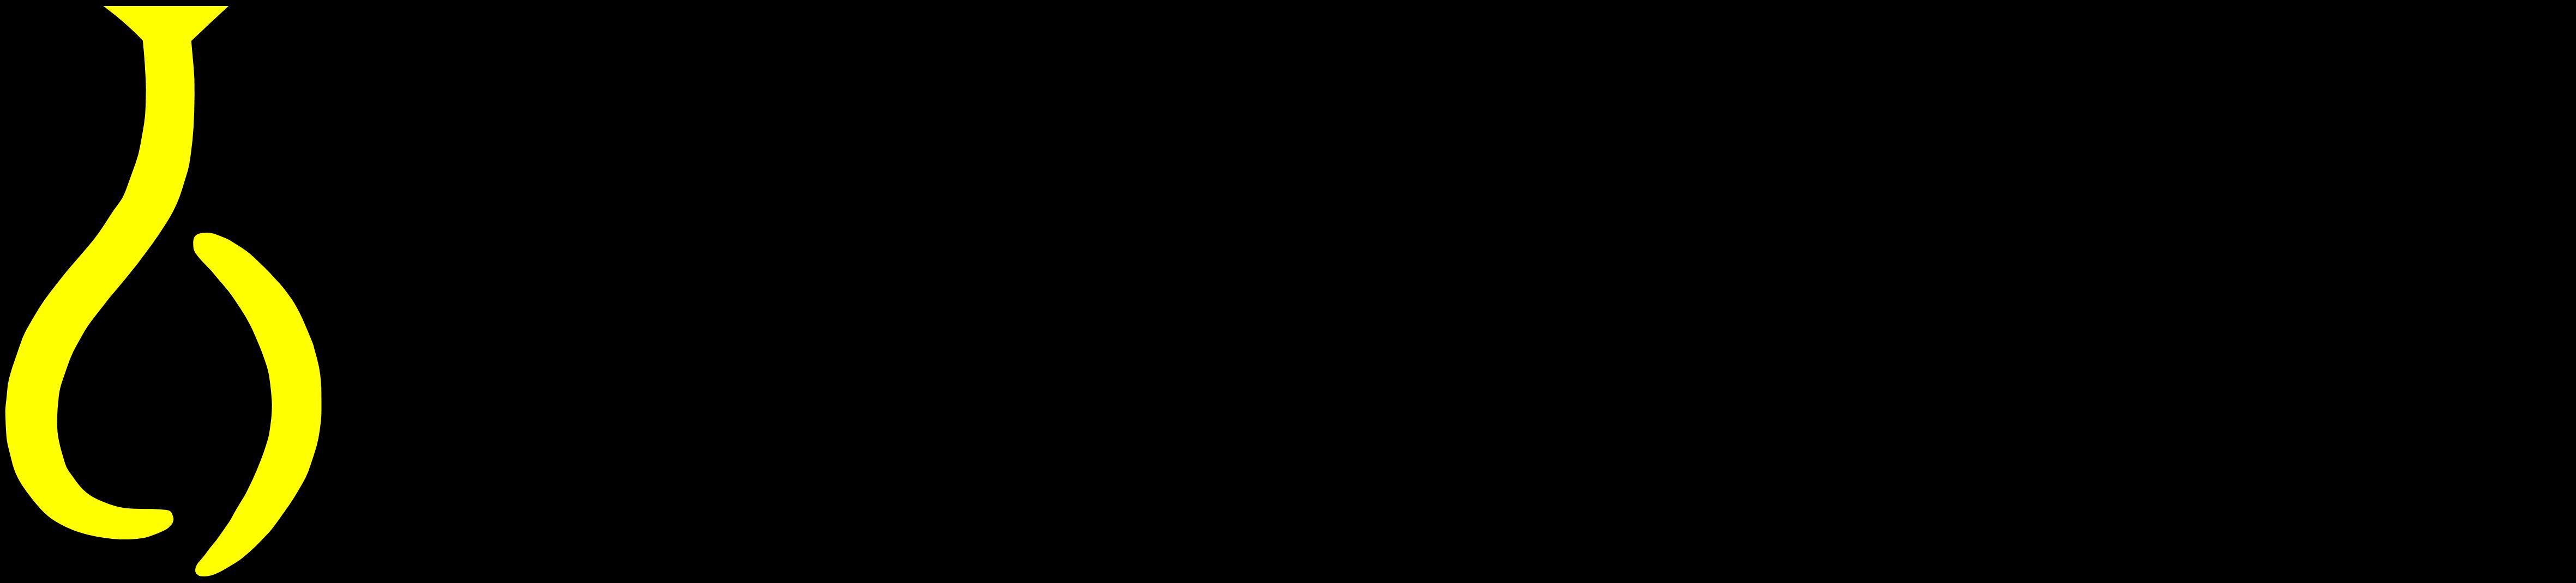 Eurachem